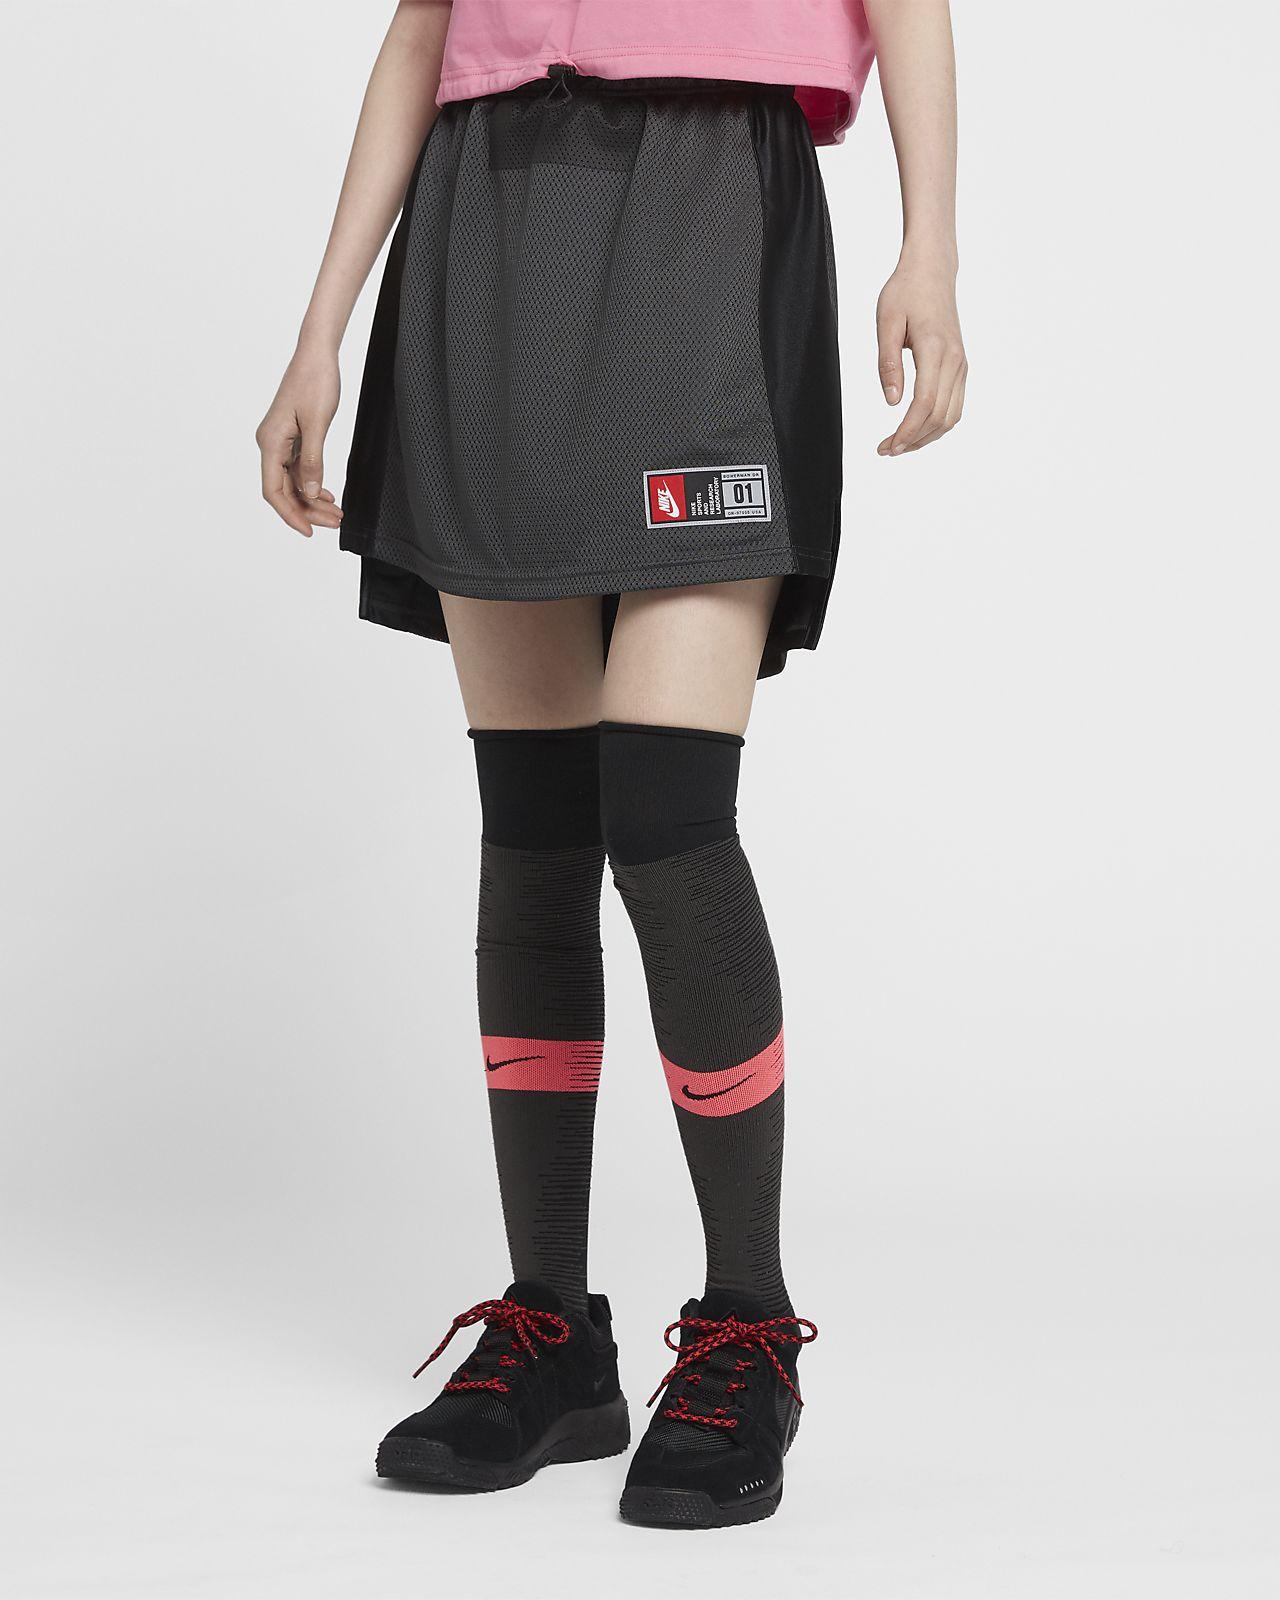 Saia de futebol NikeLab Collection para mulher